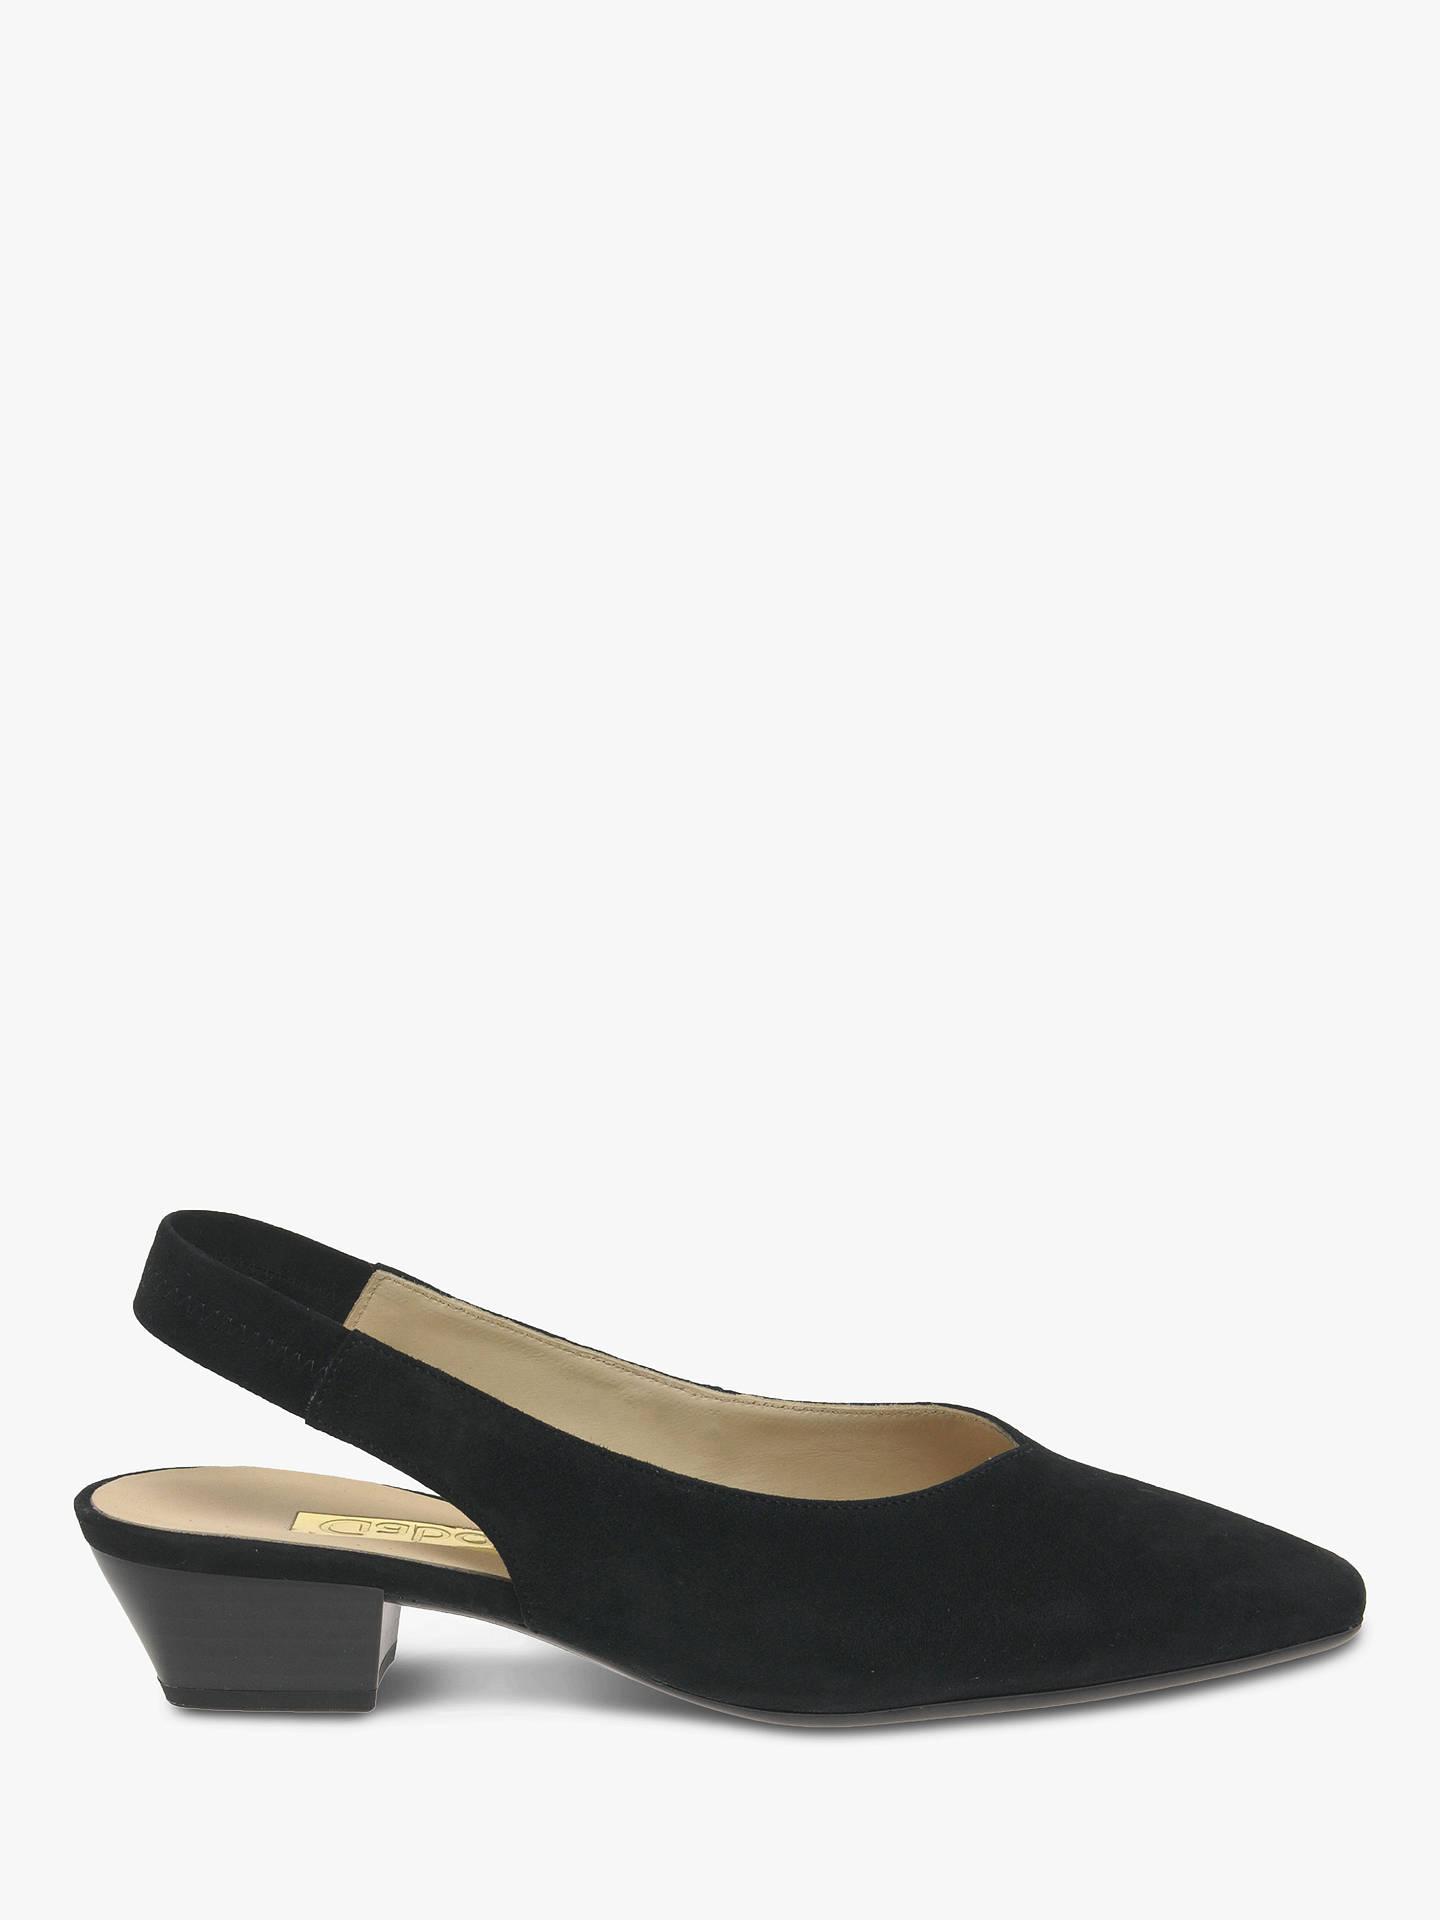 4fddf9a1f0c Gabor Heathcliffe Block Heel Slingback Court Shoes, Black Suede at ...